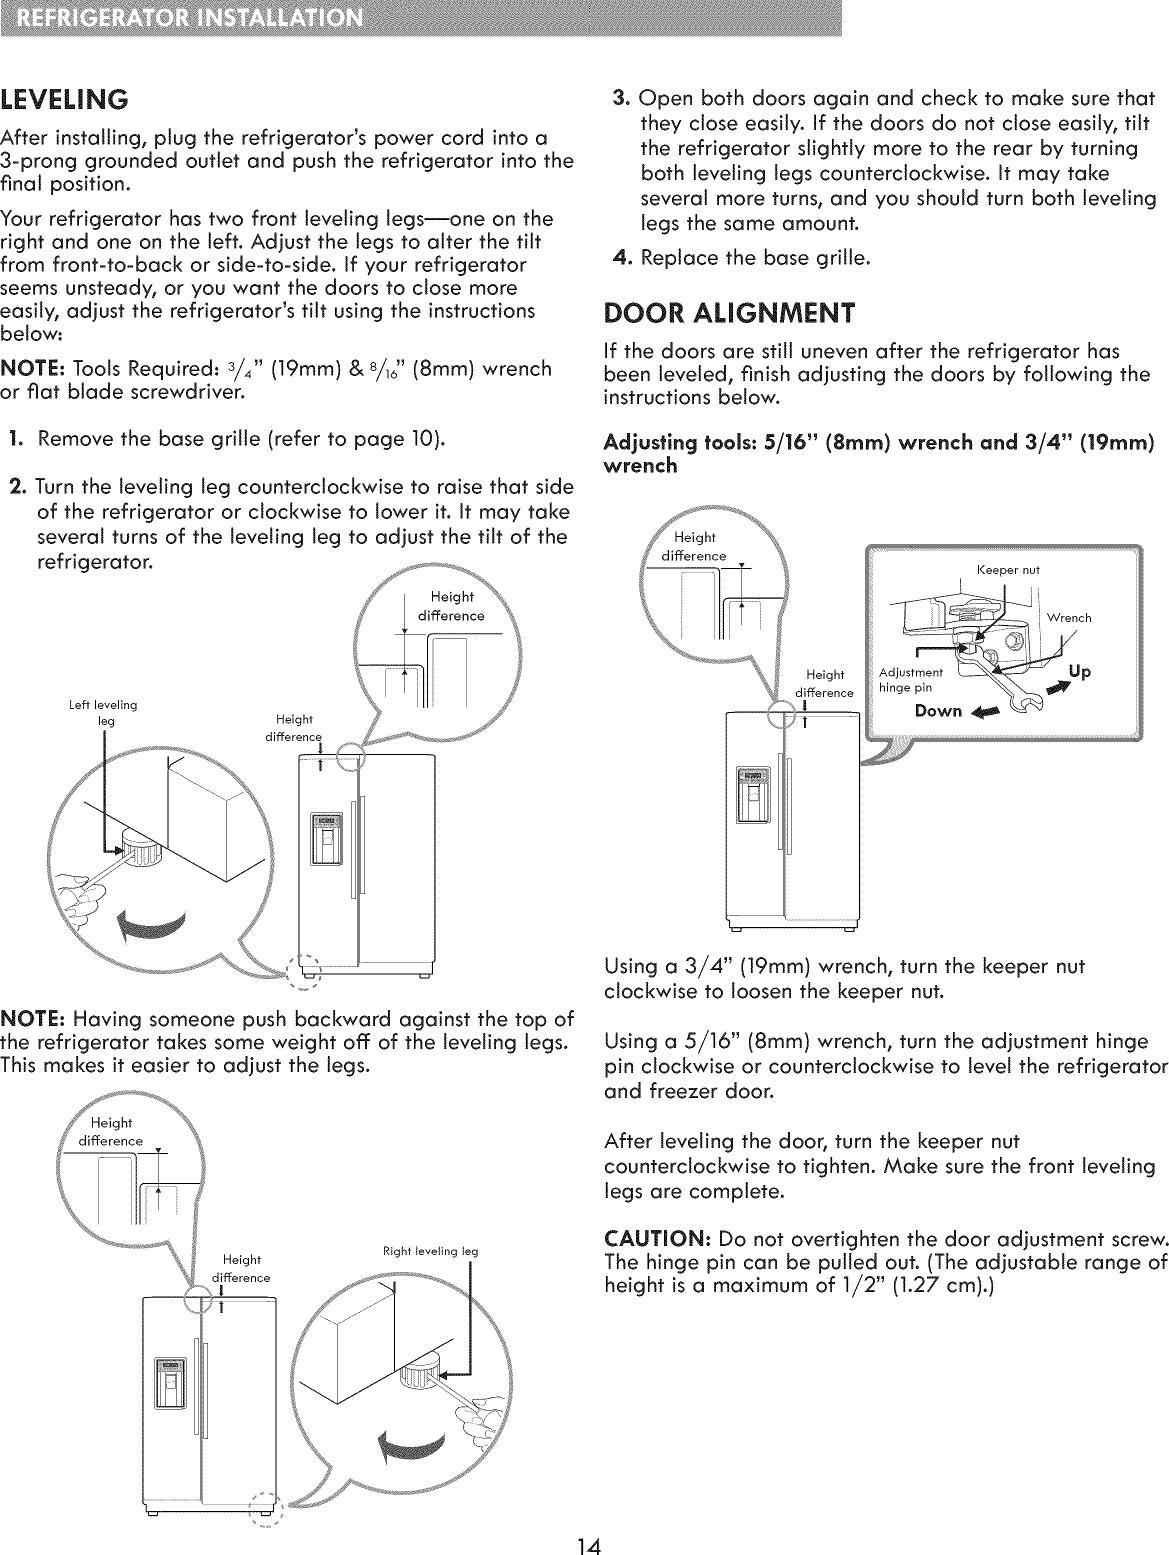 Kenmore Elite 79551822410 User Manual REFRIGERATOR Manuals And